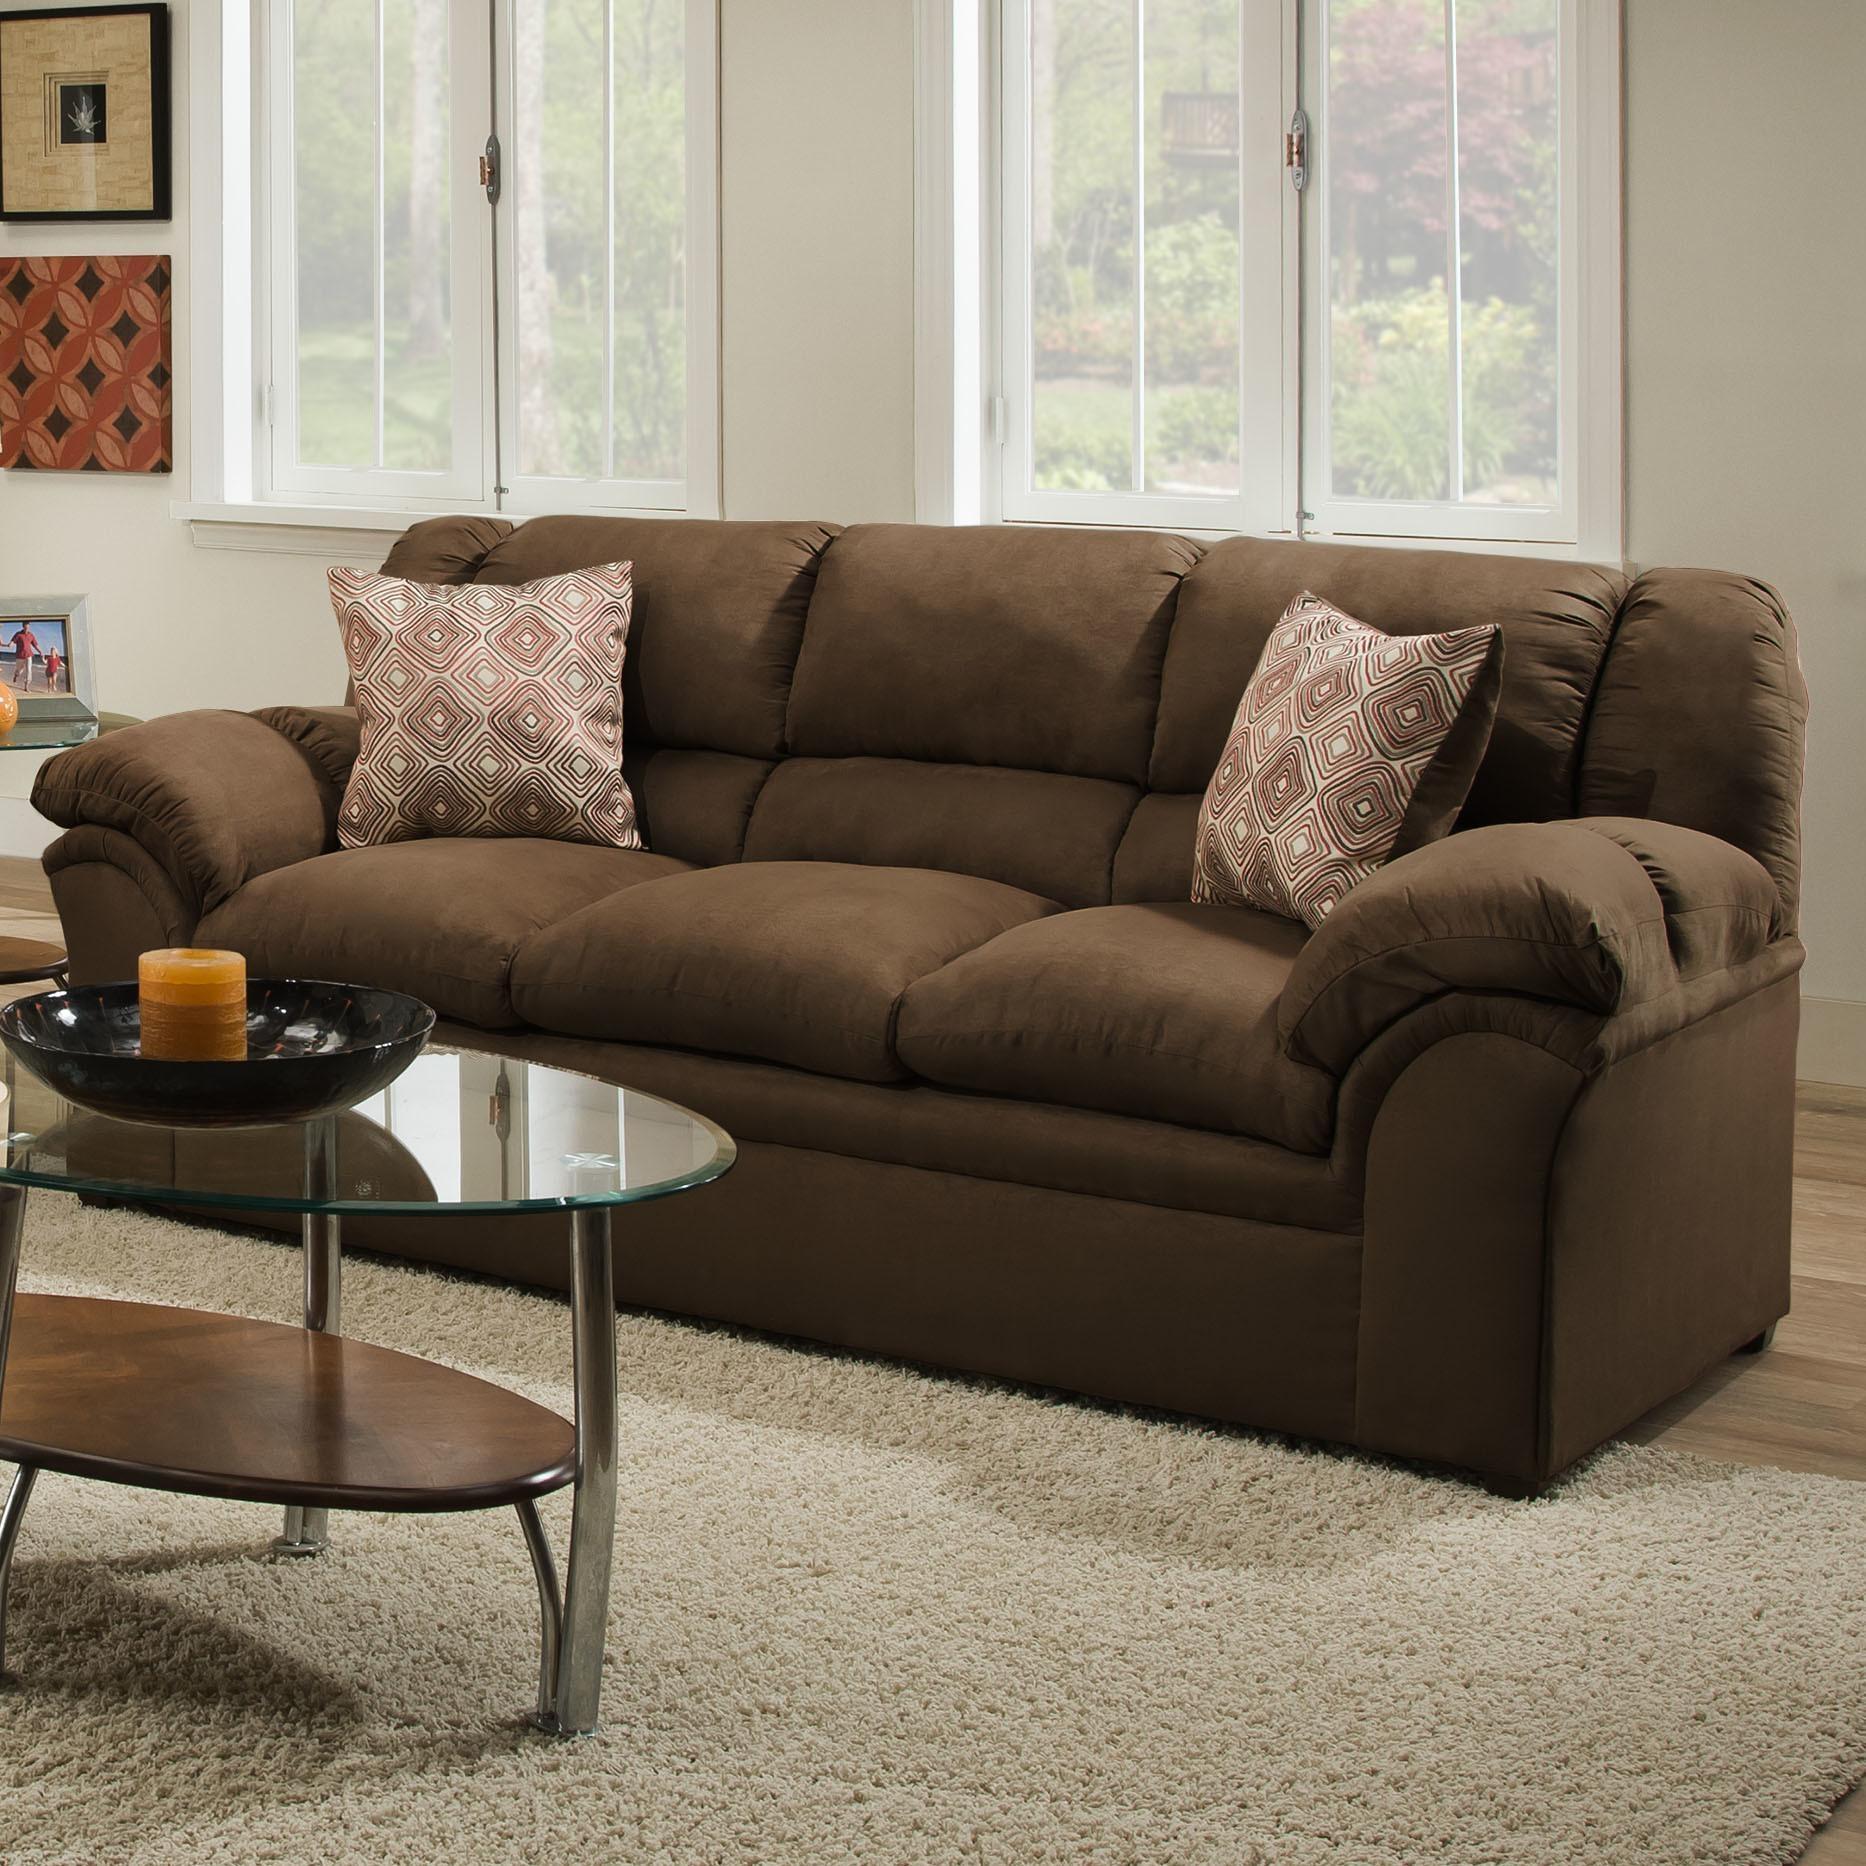 Simmons Microfiber Sofa Reviews – Modern Sofas | Tehranmix Decoration Throughout Simmons Microfiber Sofas (Image 14 of 20)